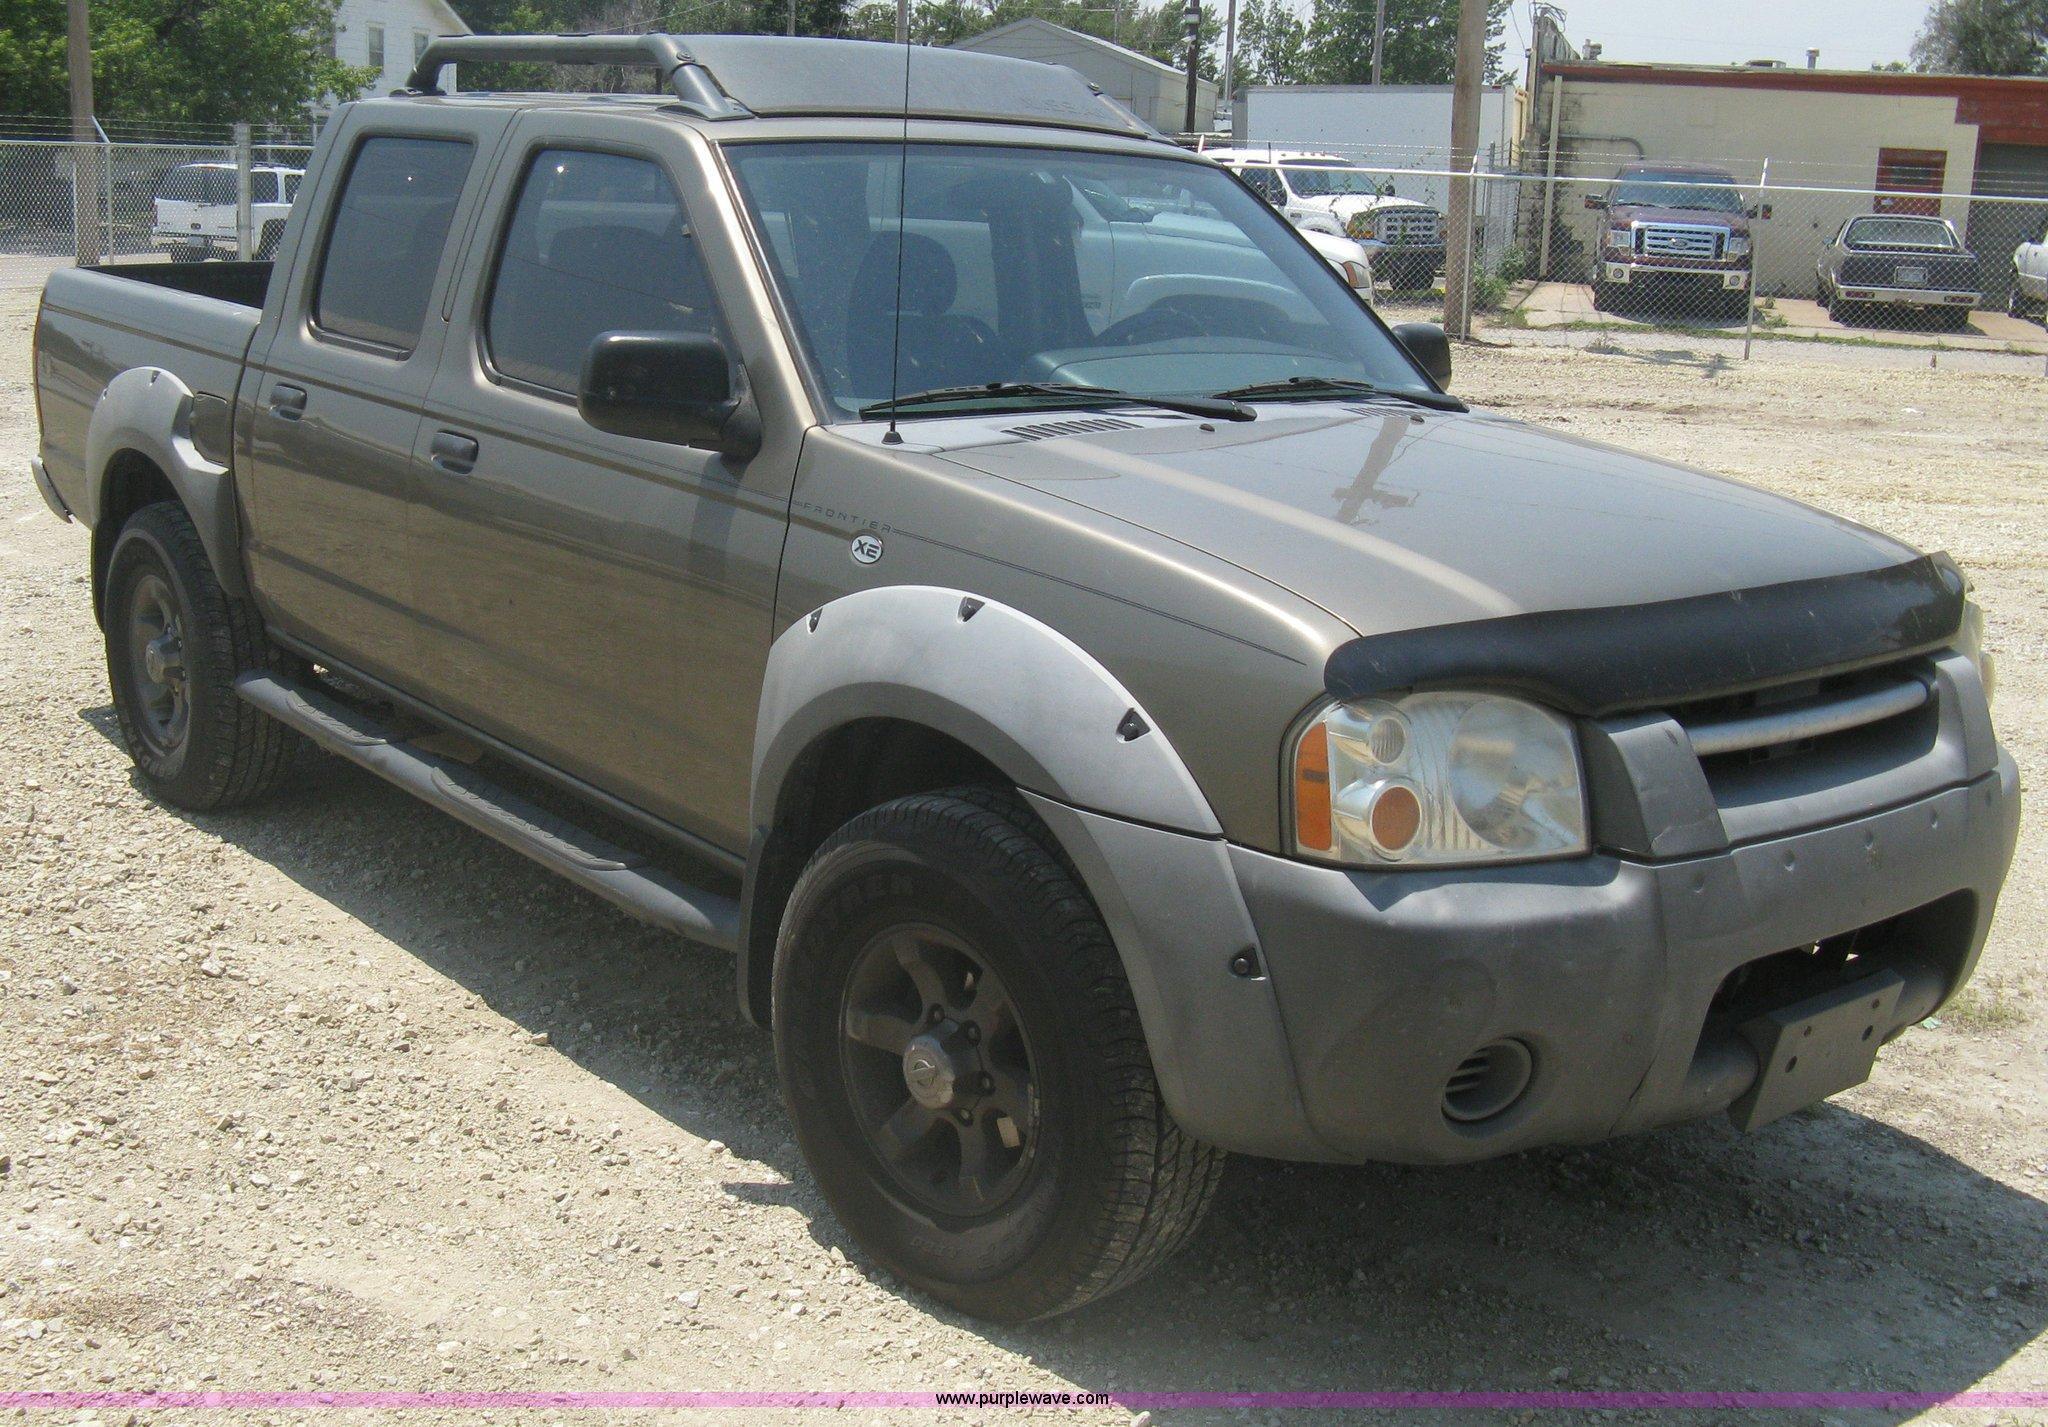 2001 Nissan Frontier Xe Crew Cab Pickup Truck